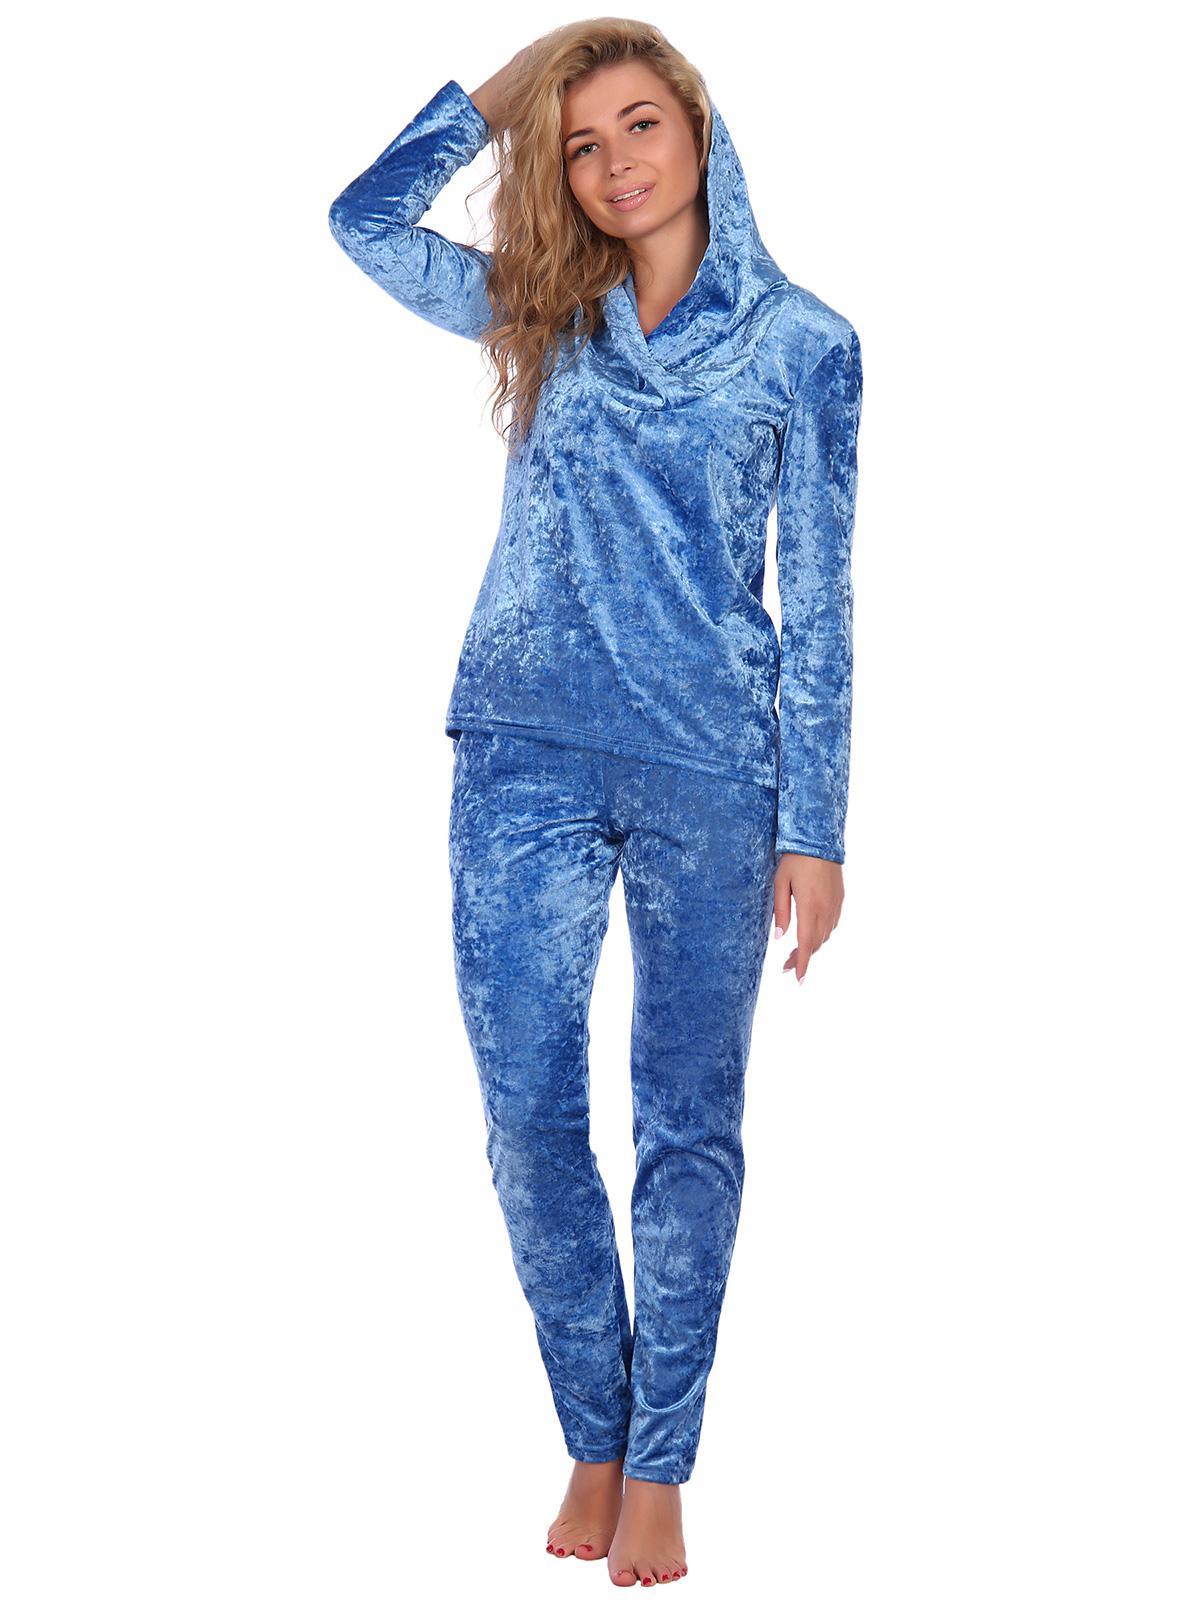 Жен. костюм арт. 16-0236 Голубой р. 50 НСД Трикотаж